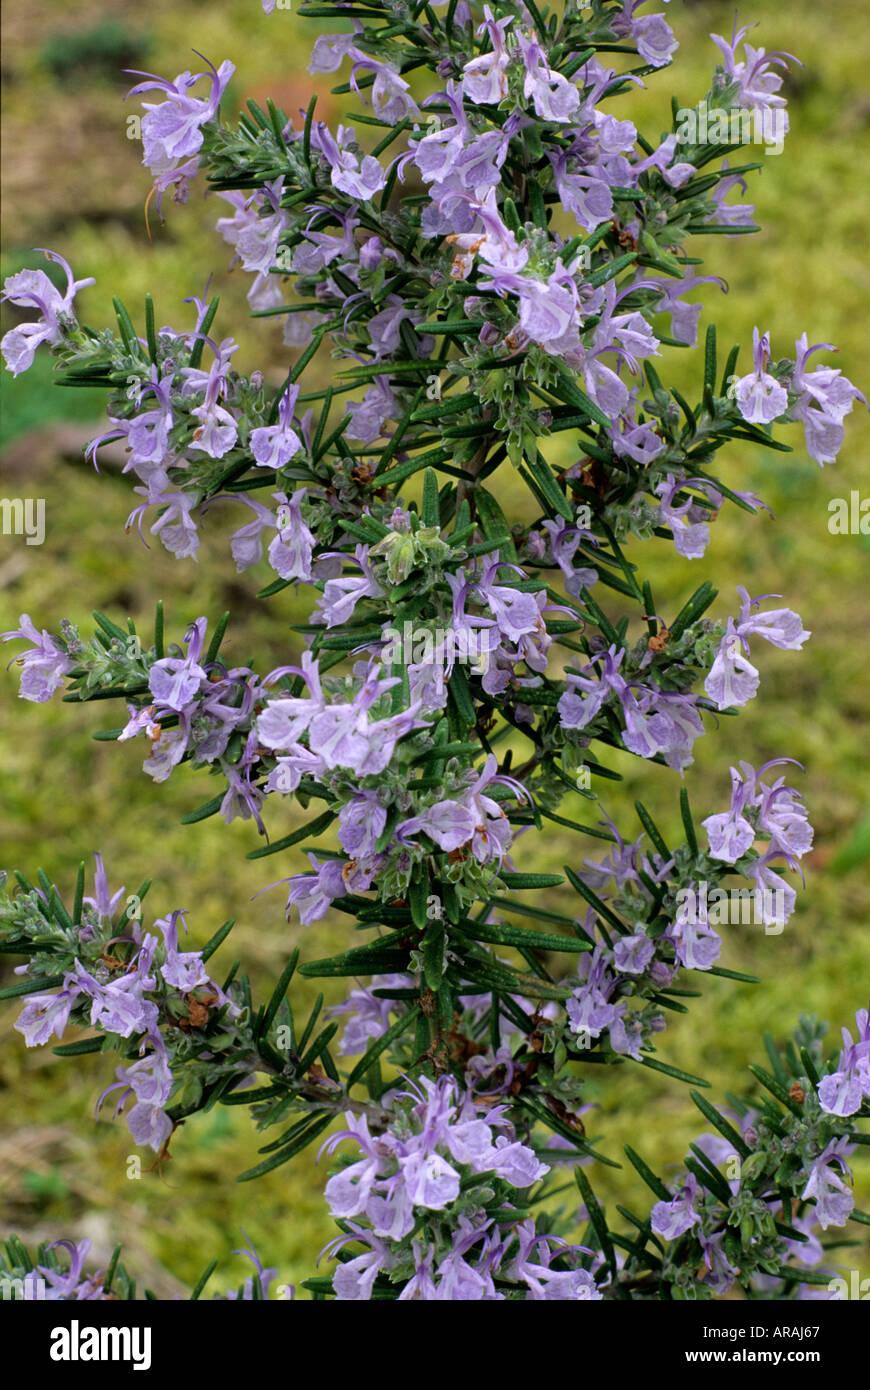 Rosmarinus 'Miss Jessop's Upright' Jessop Rosemary fleur bleue fleurs jardin plantes plantes herbes Herbes rosemarys Photo Stock